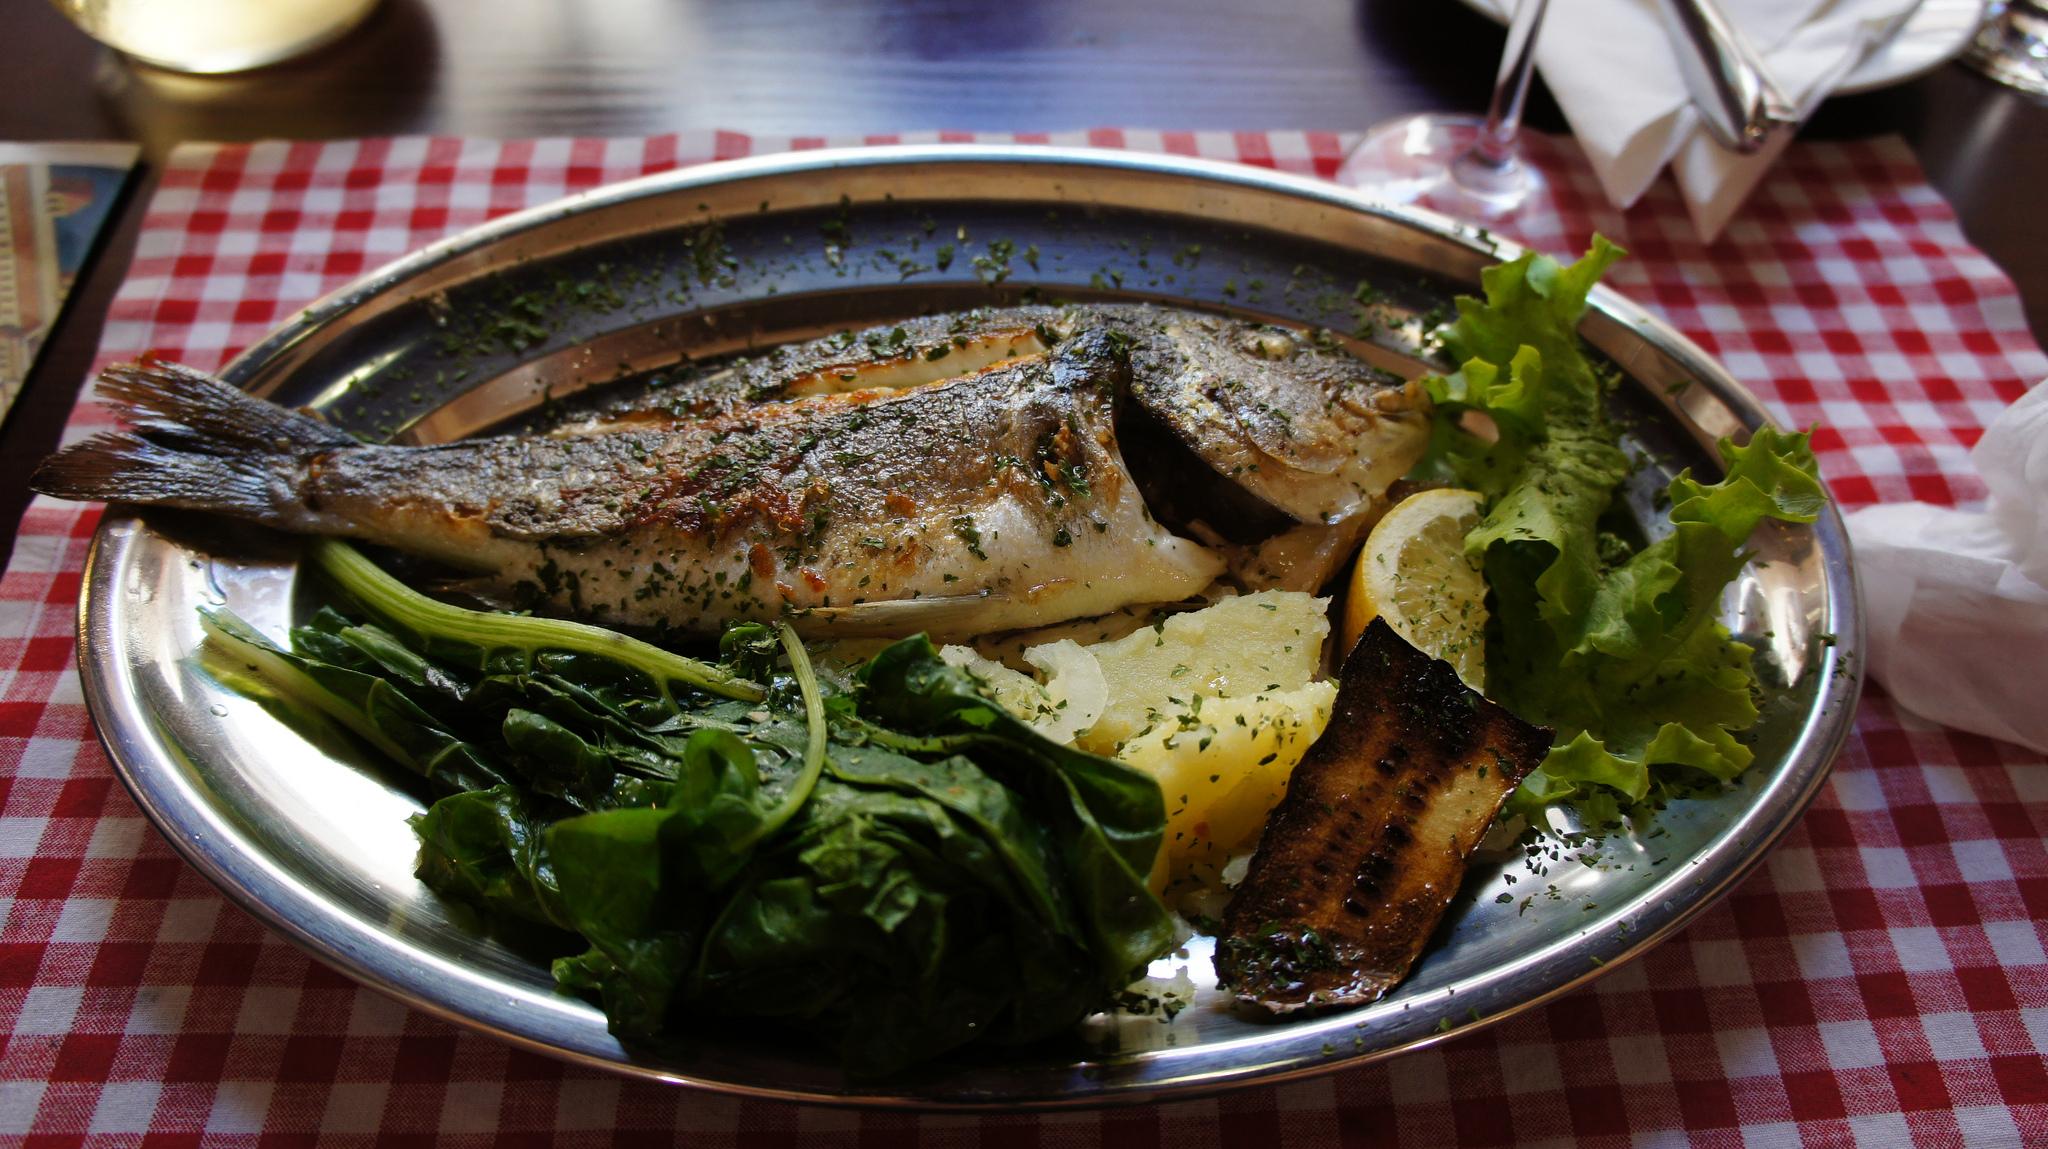 The 10 Best Restaurants In Fresno